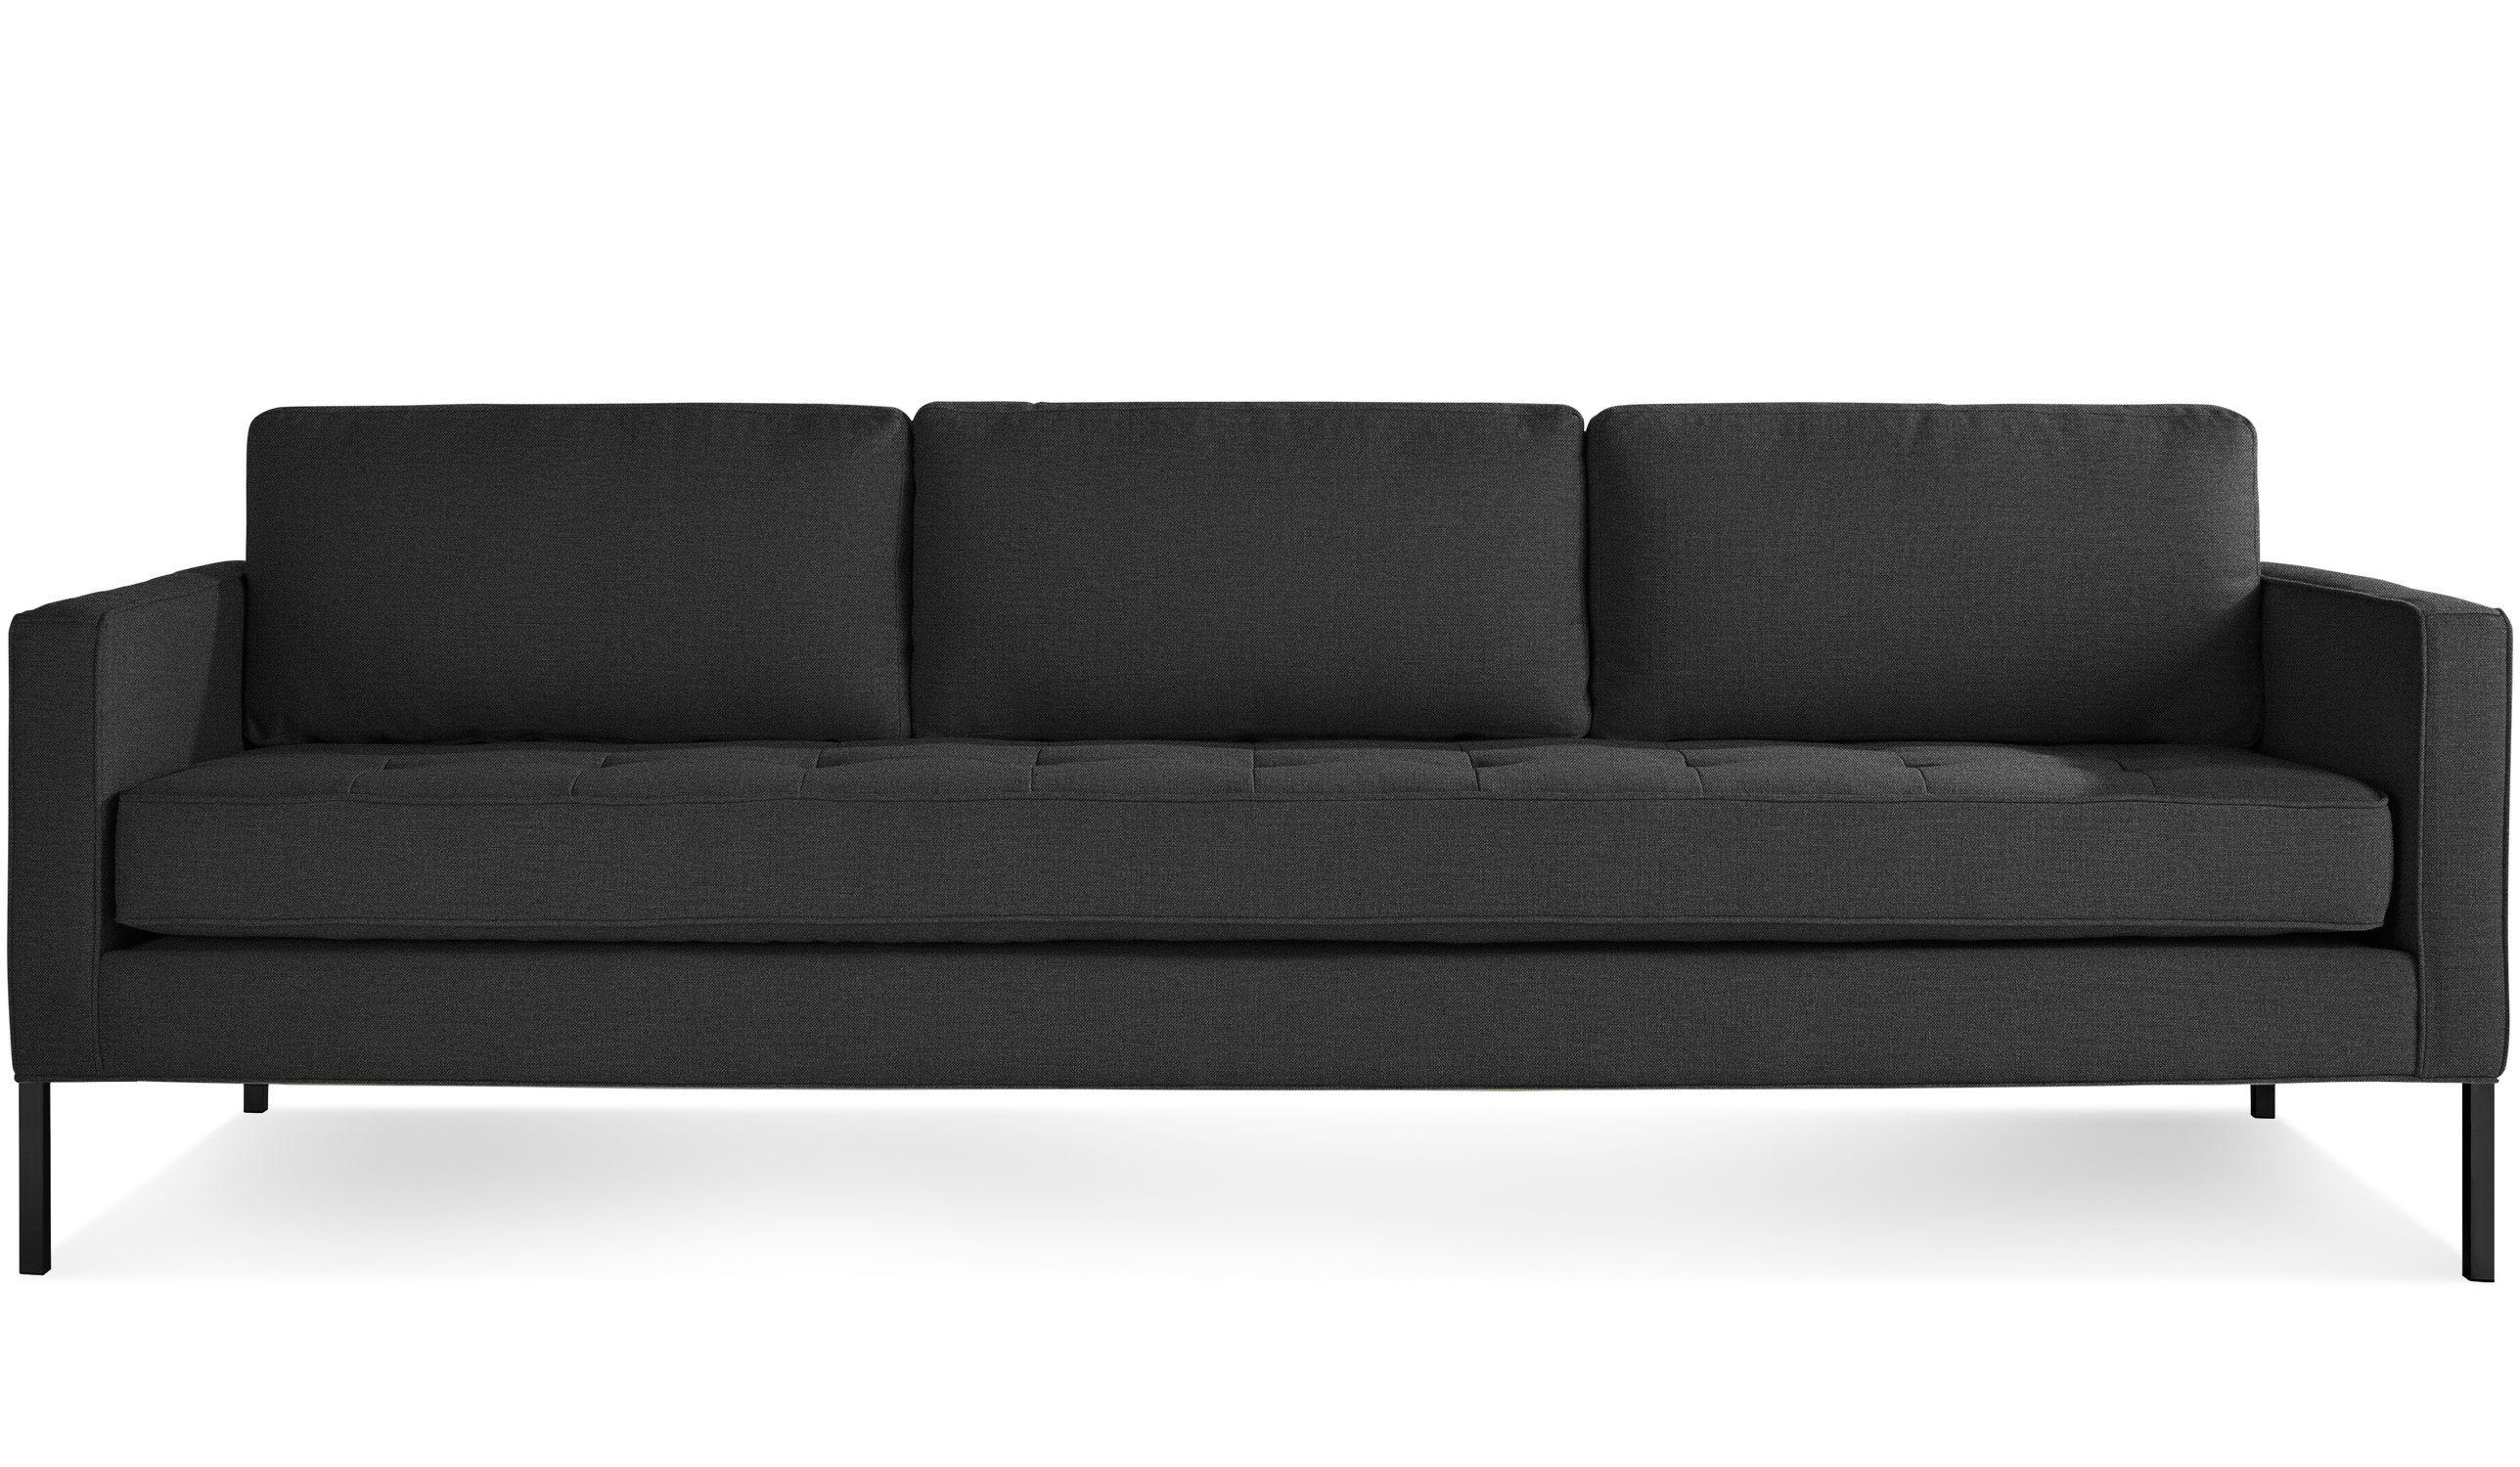 Phenomenal Paramount Sofa Home The Honoroak Download Free Architecture Designs Xerocsunscenecom